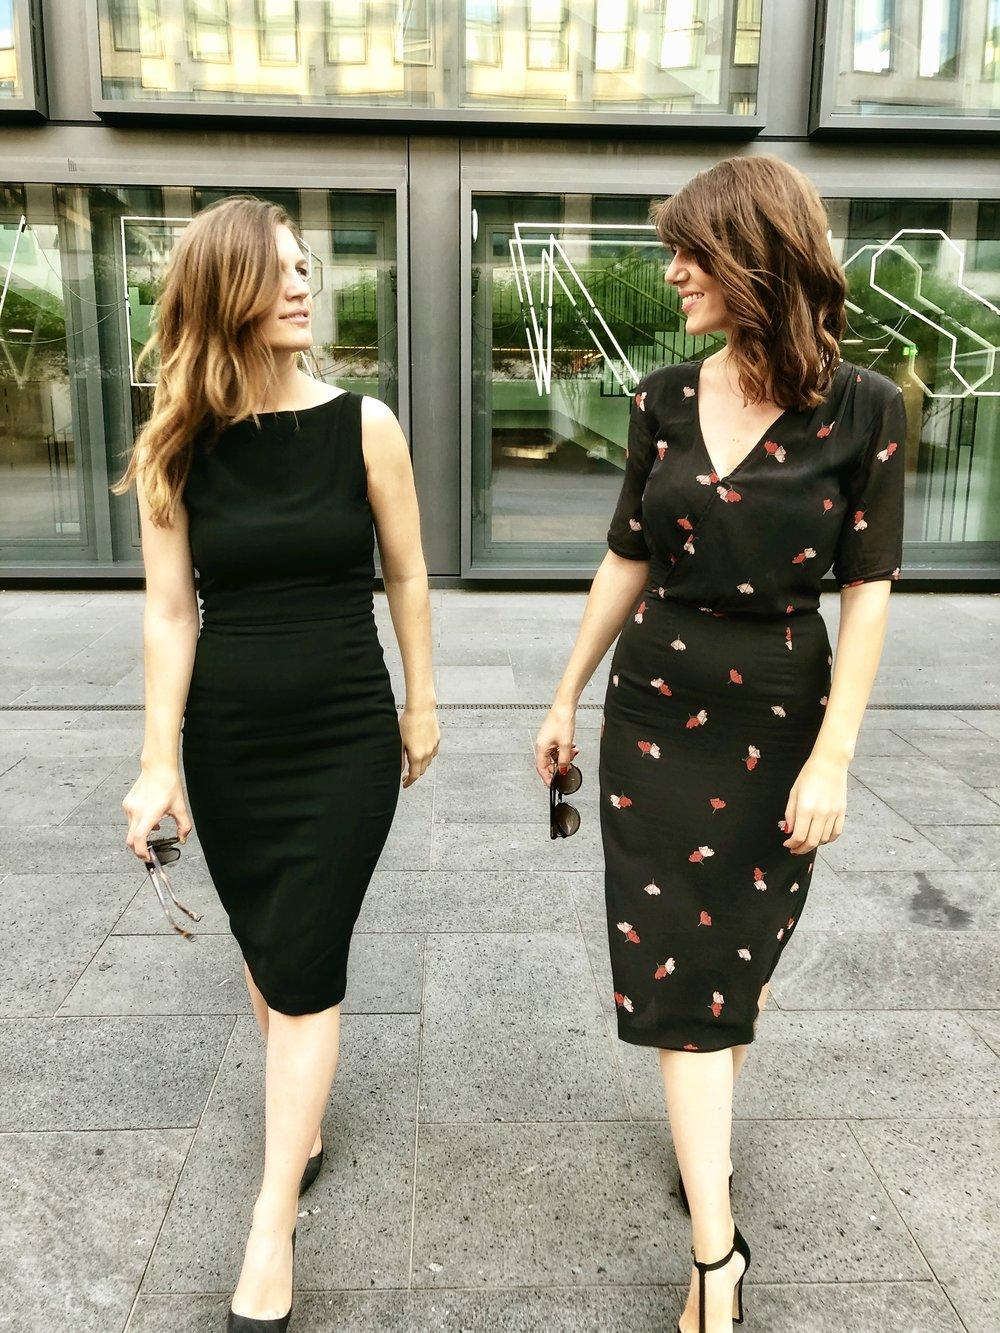 Silk Poppy Dress on the right.